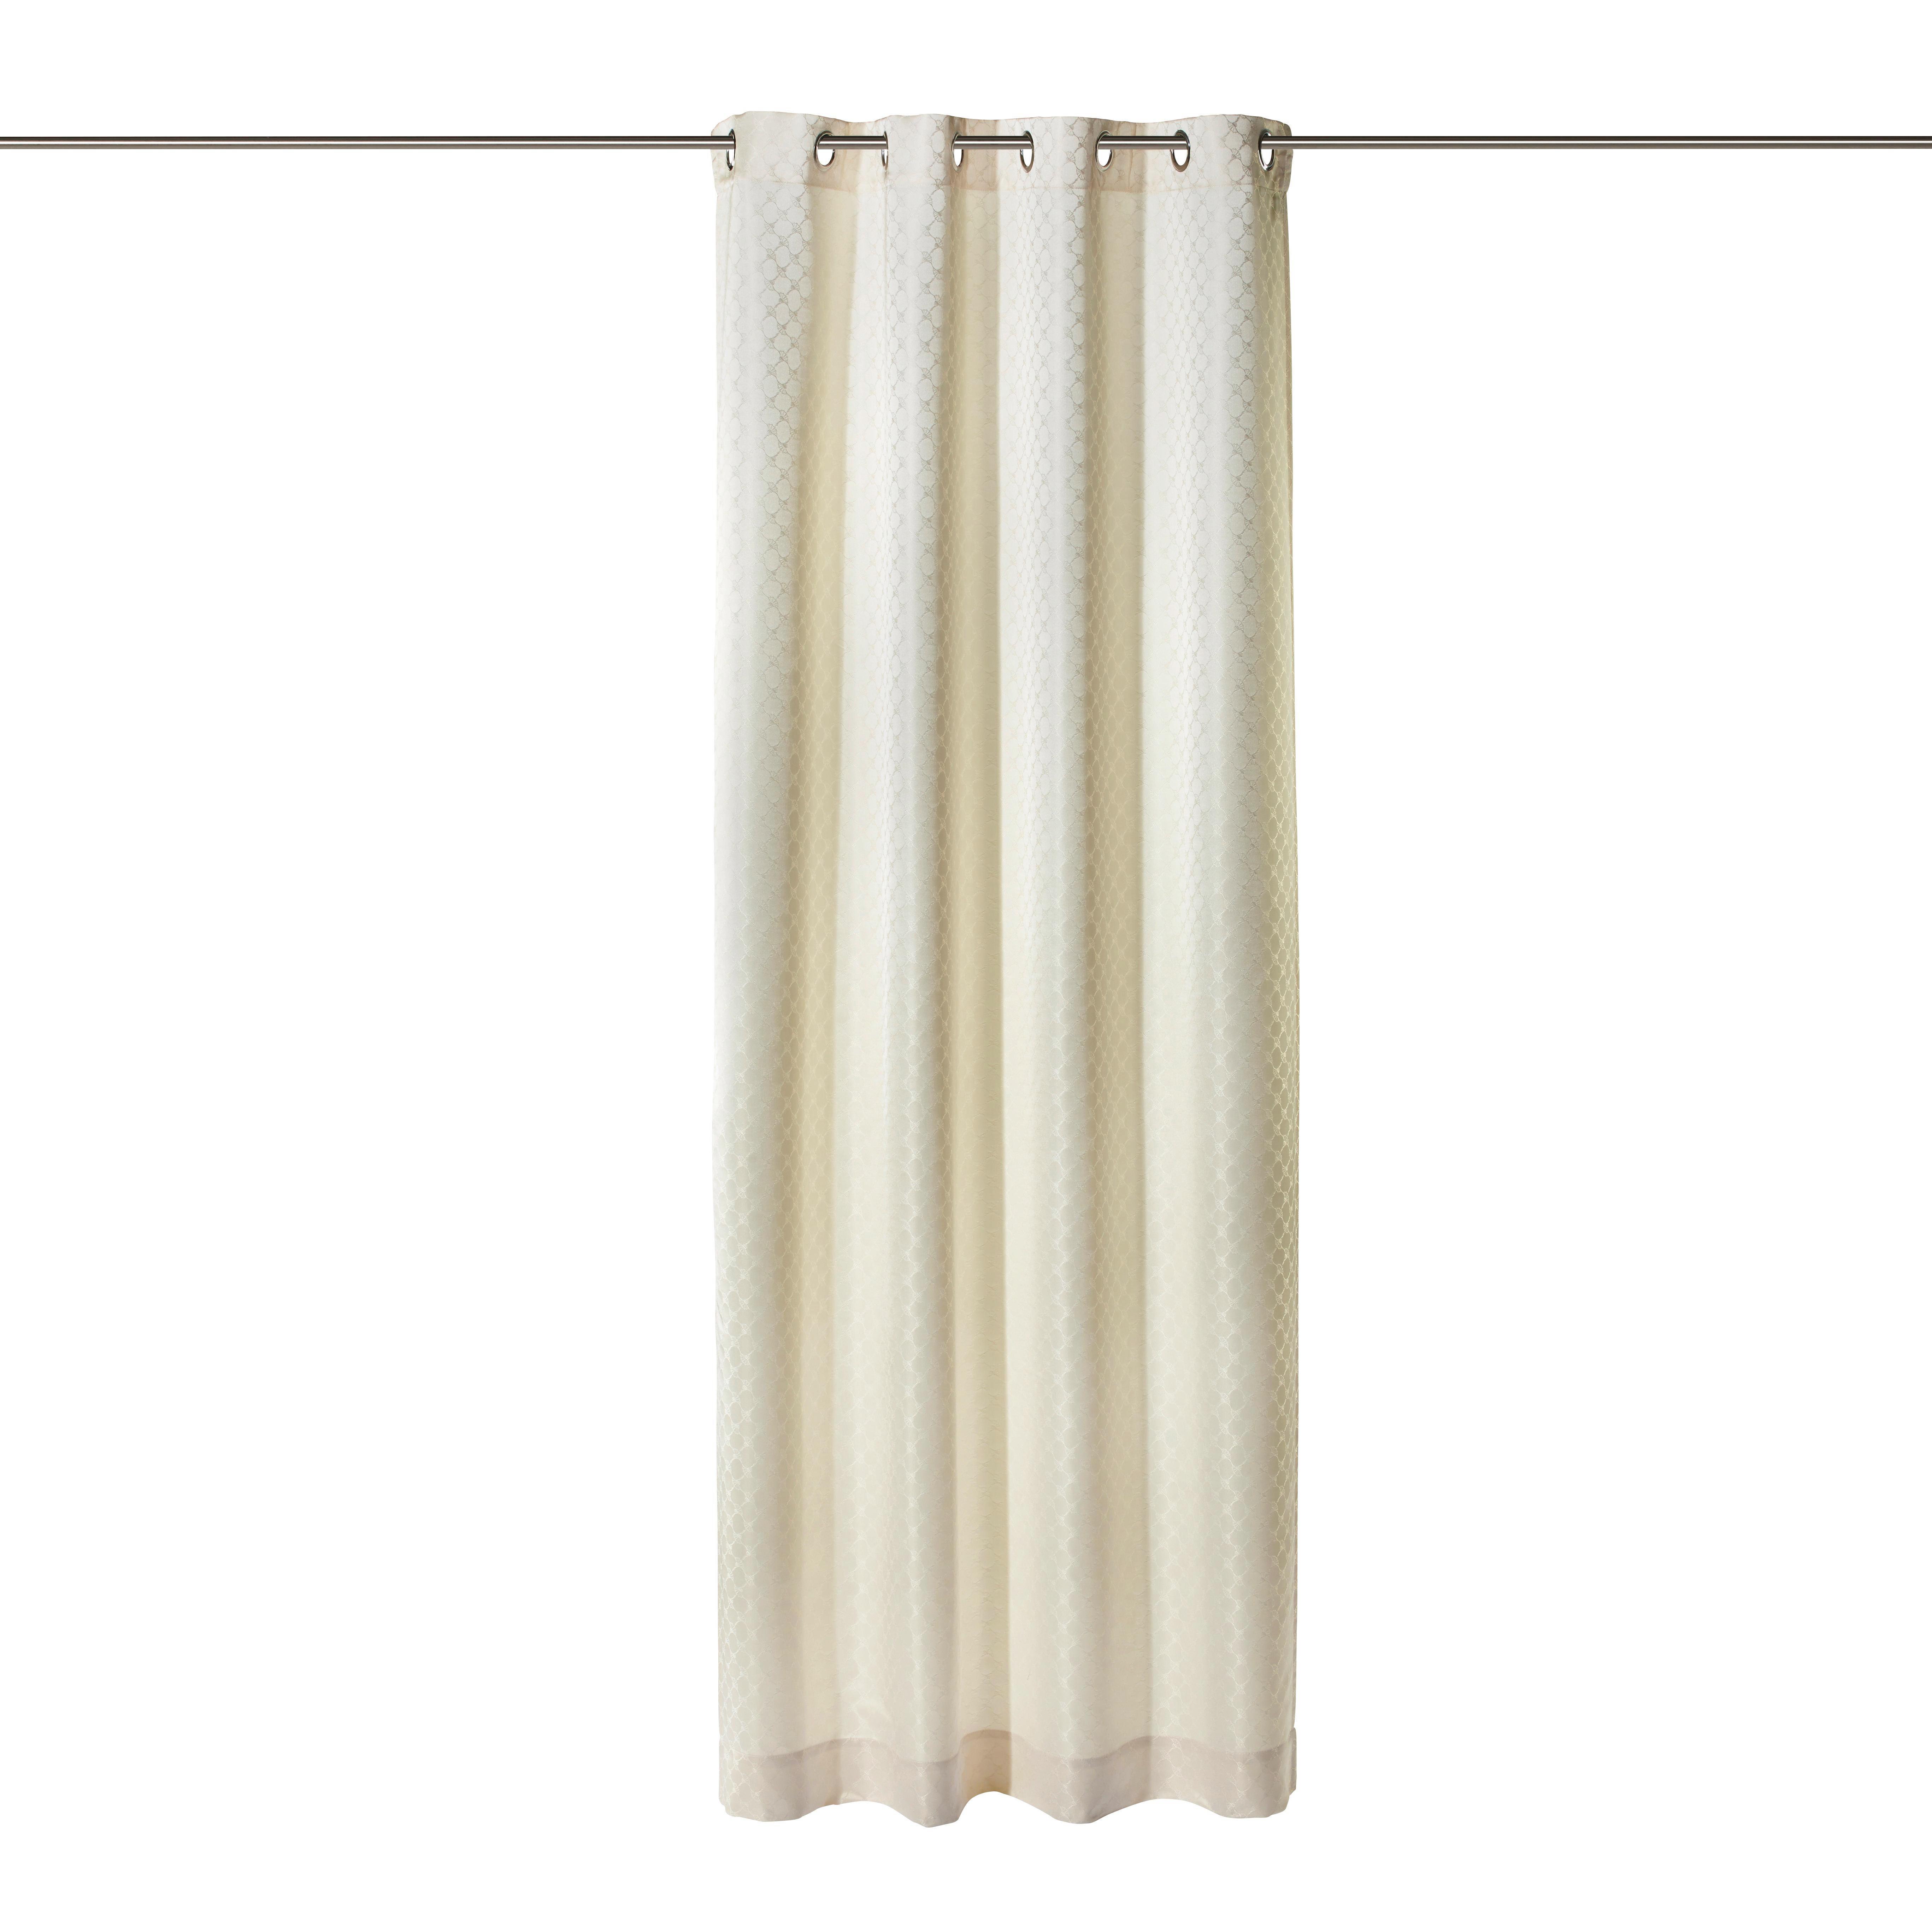 ÖSENSCHAL  blickdicht   140/250 cm - Naturfarben, Basics, Textil (140/250cm) - JOOP!